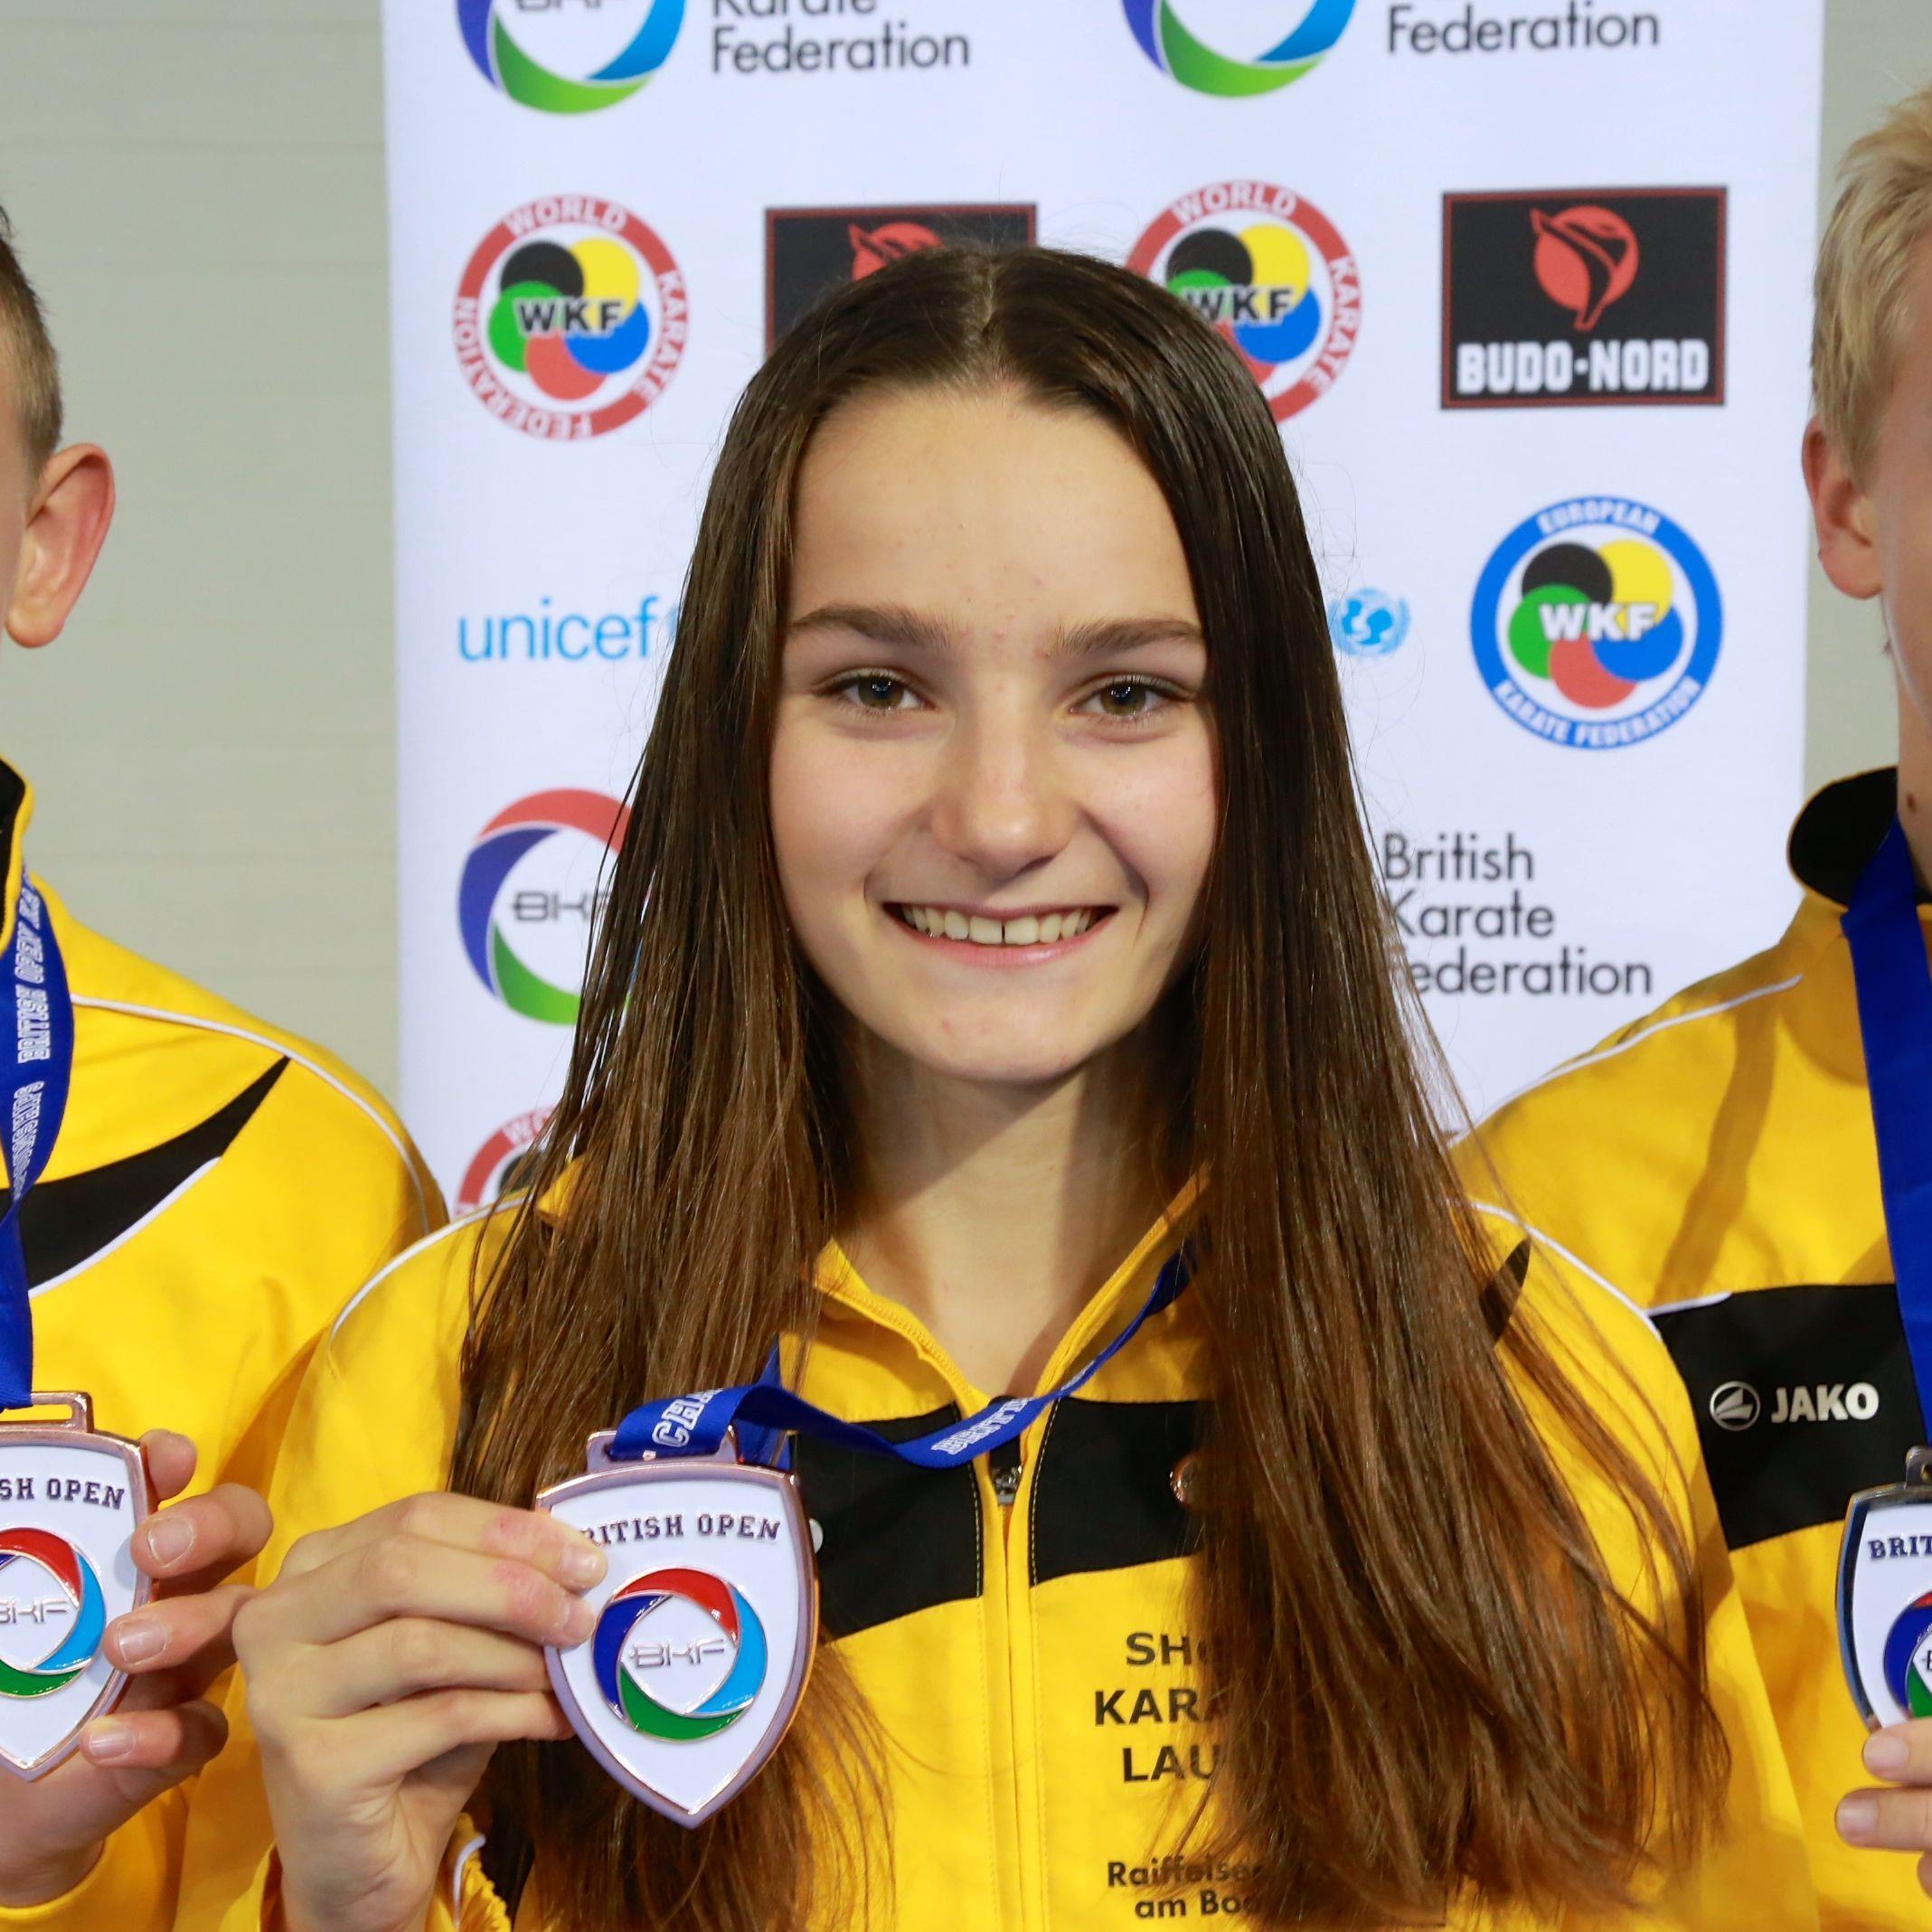 Jubel bei den jungen Lauteracher Karatekas nach den starken Leistungen in England.